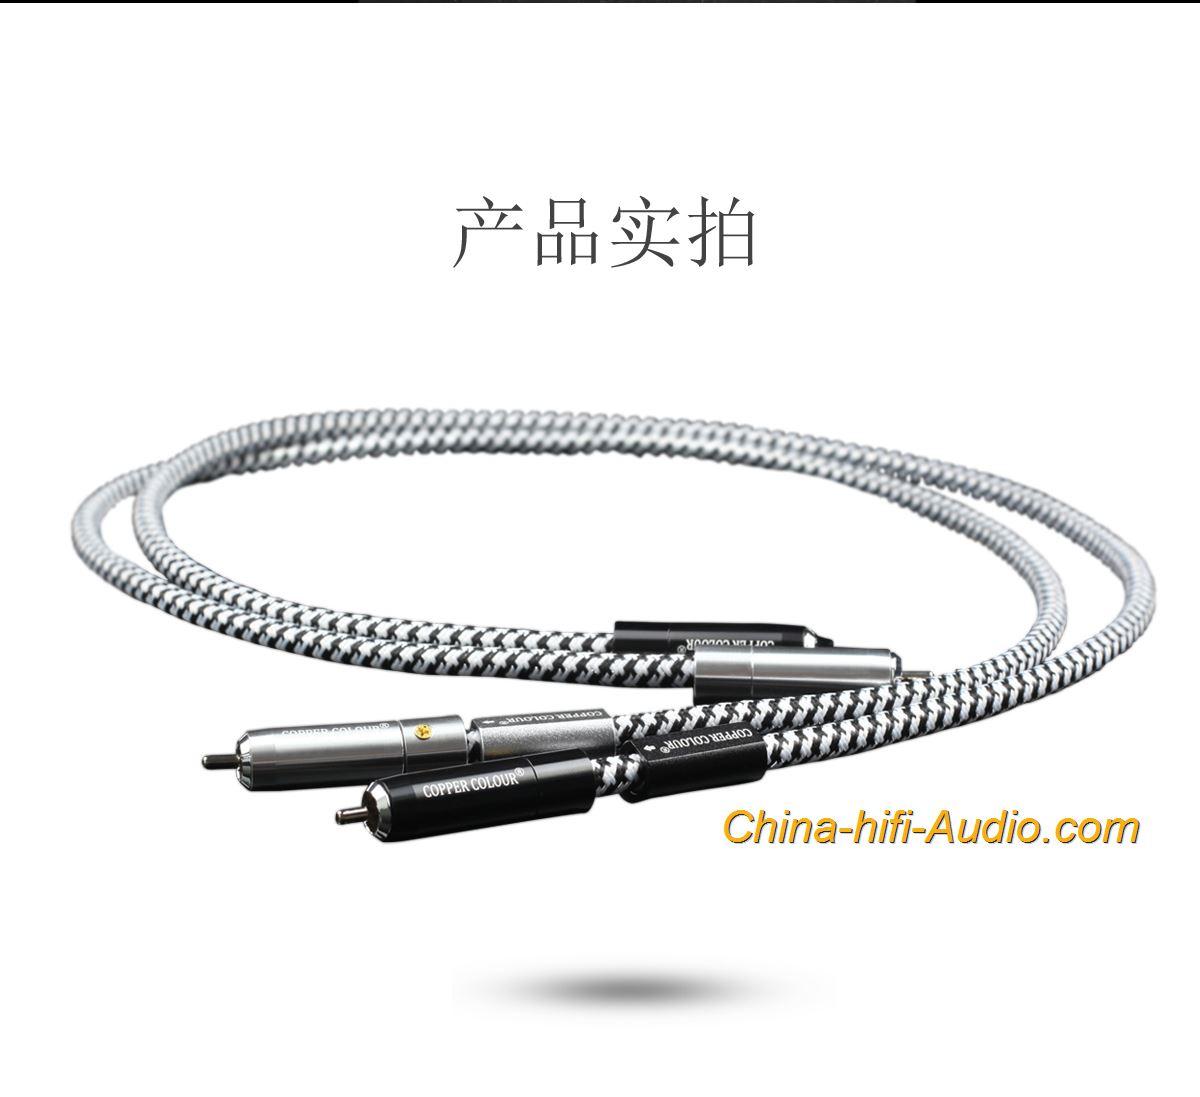 copper colour cc whisper occ rca interconector hi fi audio cable pair china hifi audio online. Black Bedroom Furniture Sets. Home Design Ideas